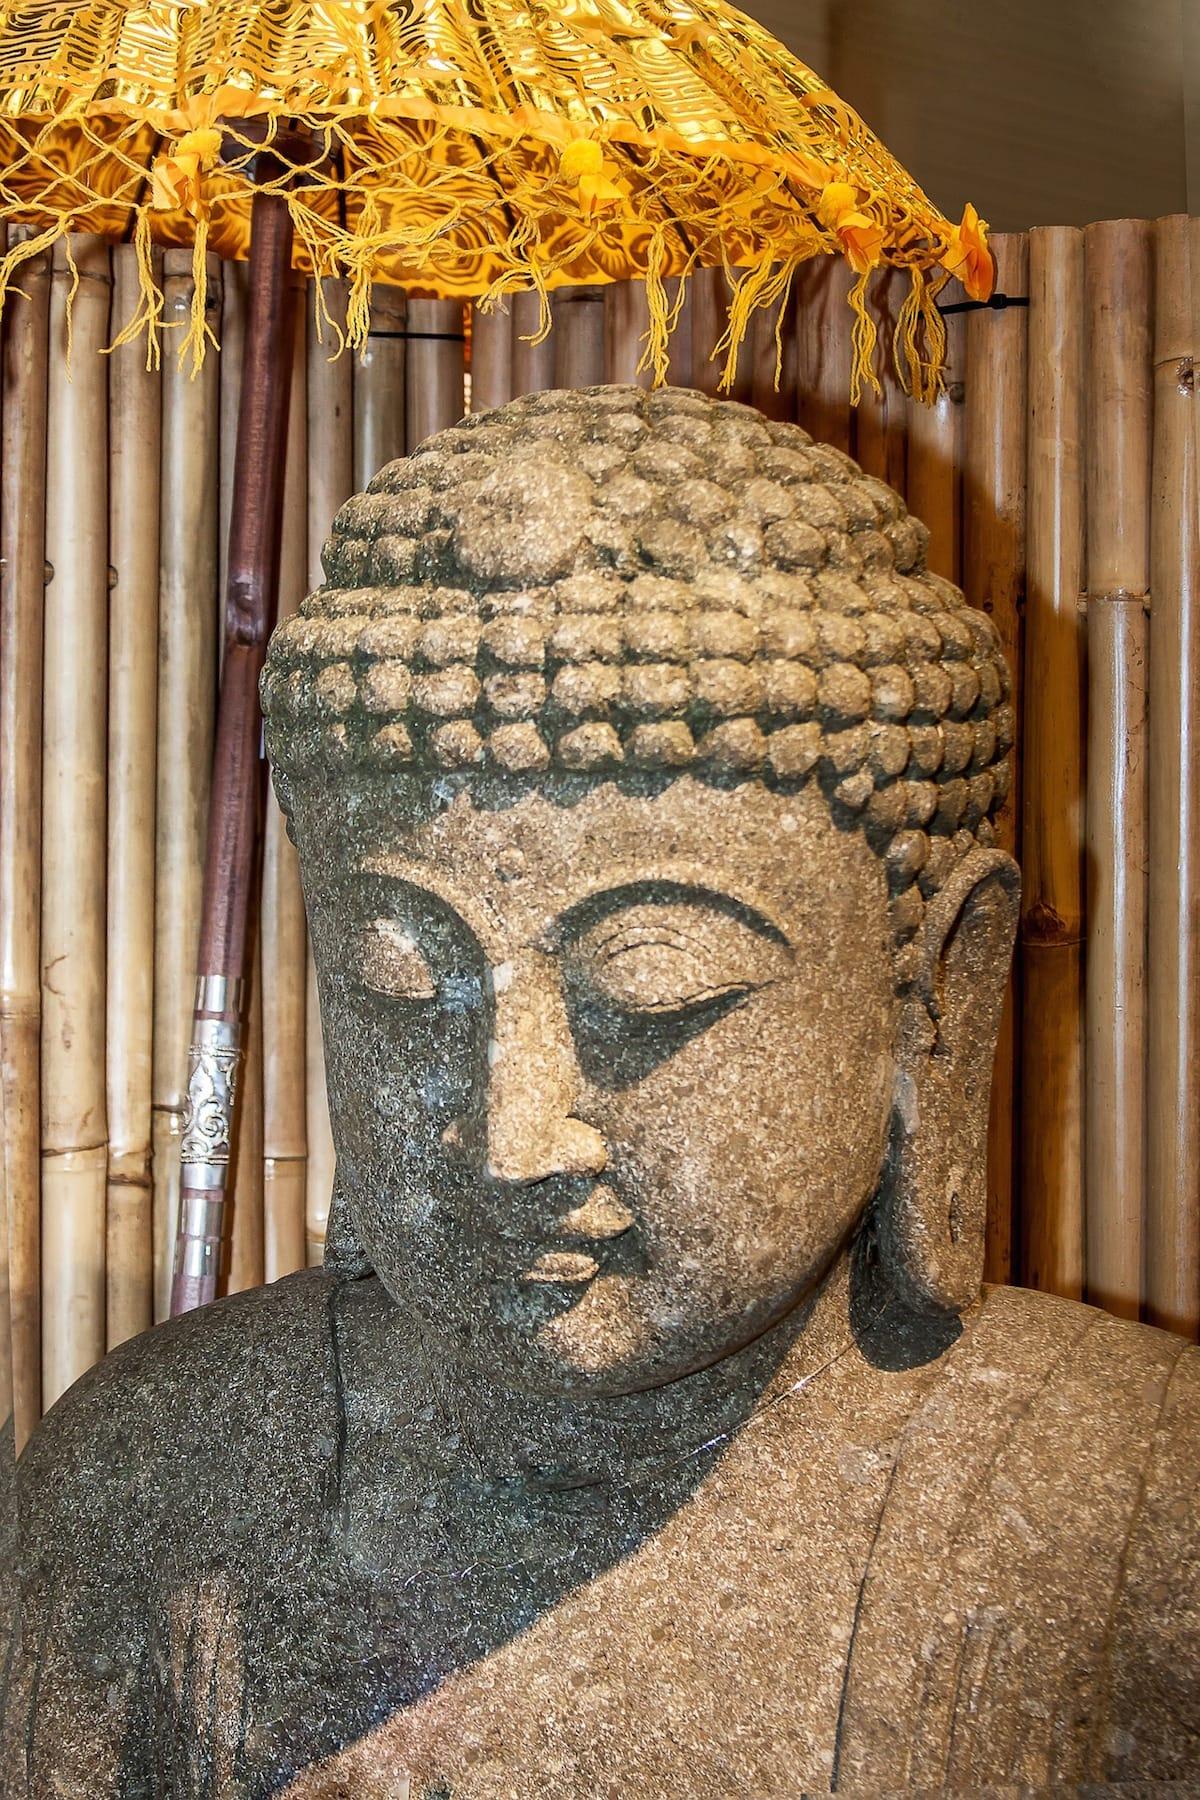 Self, Vajrayana / Tibetan Buddhism, Meditation, Sakyong Mipham,, Shambhala Sun, Lion's Roar, Buddhism